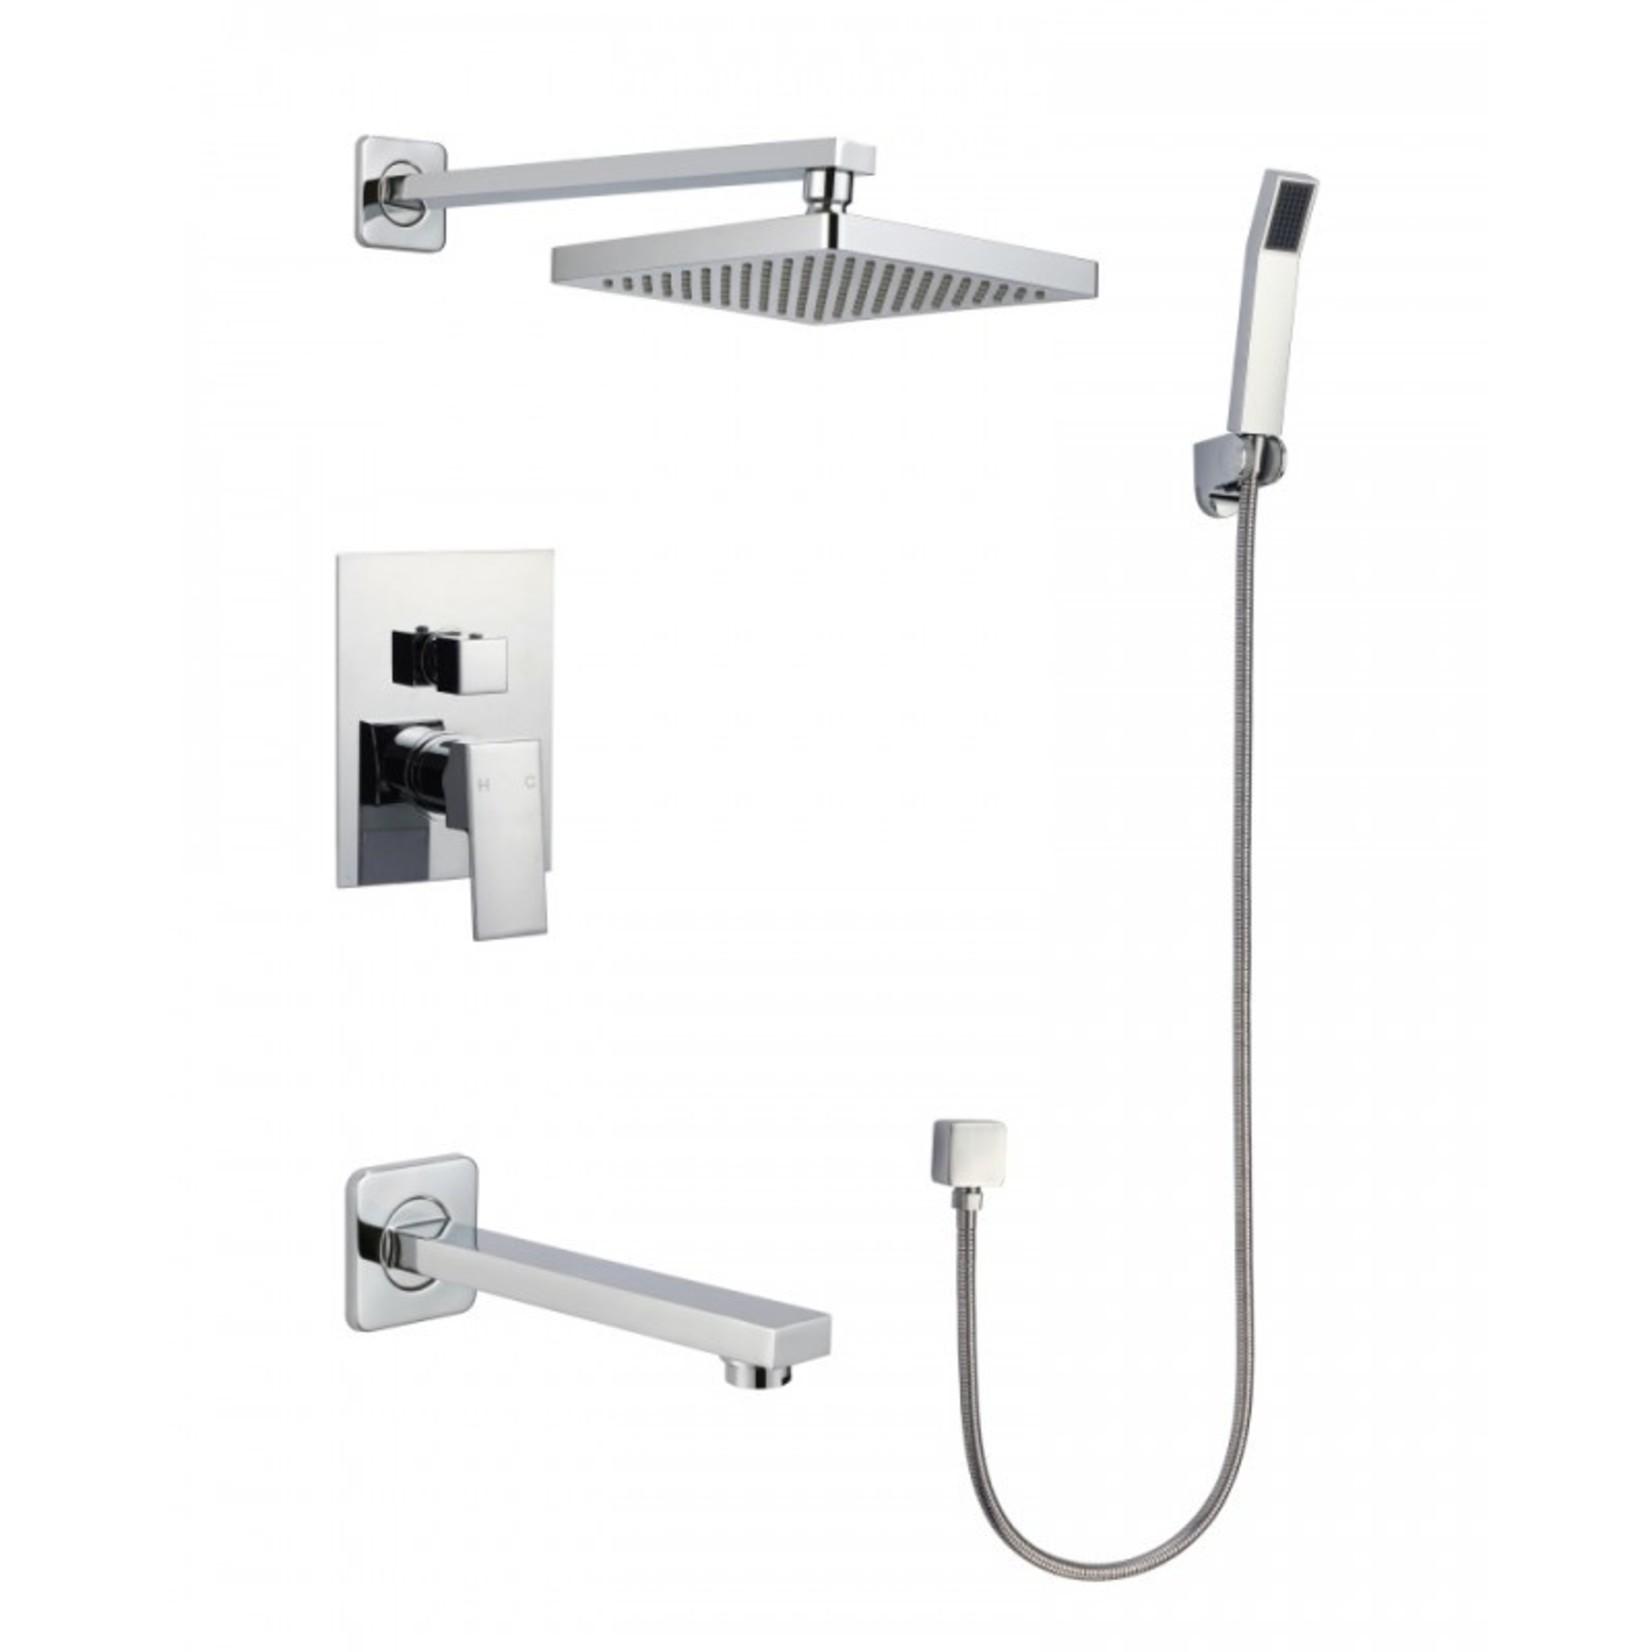 Shower faucet set Chrome Kimmi collection 6h26